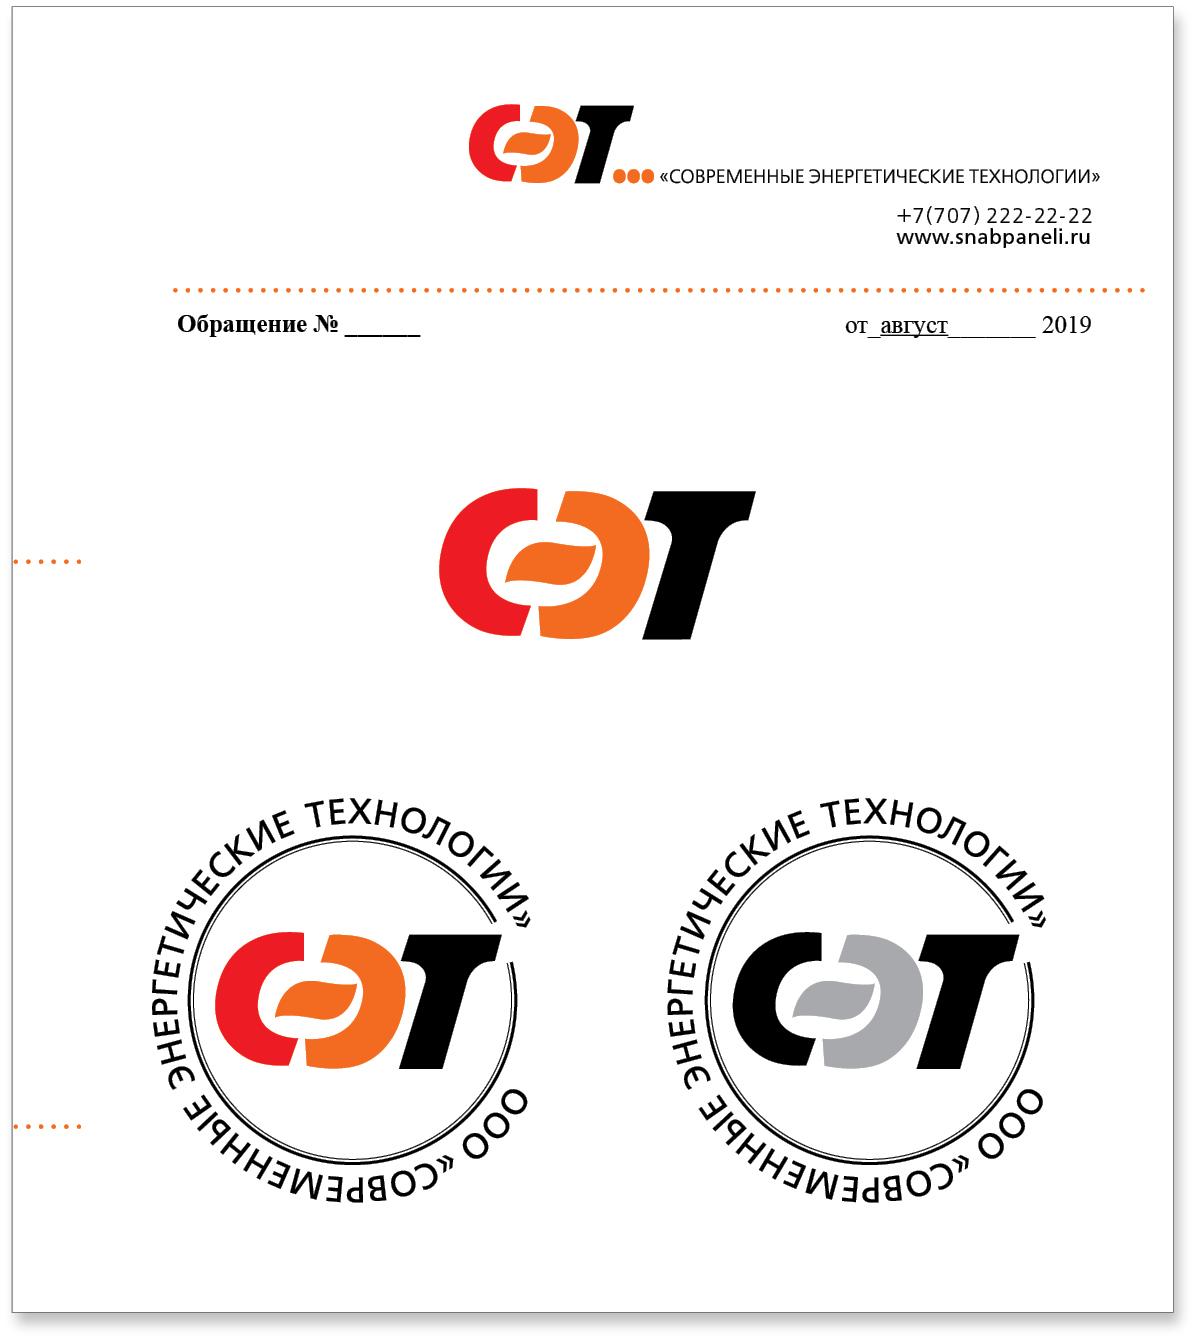 Срочно! Дизайн логотипа ООО «СЭТ» фото f_4775d4d4788356a1.jpg